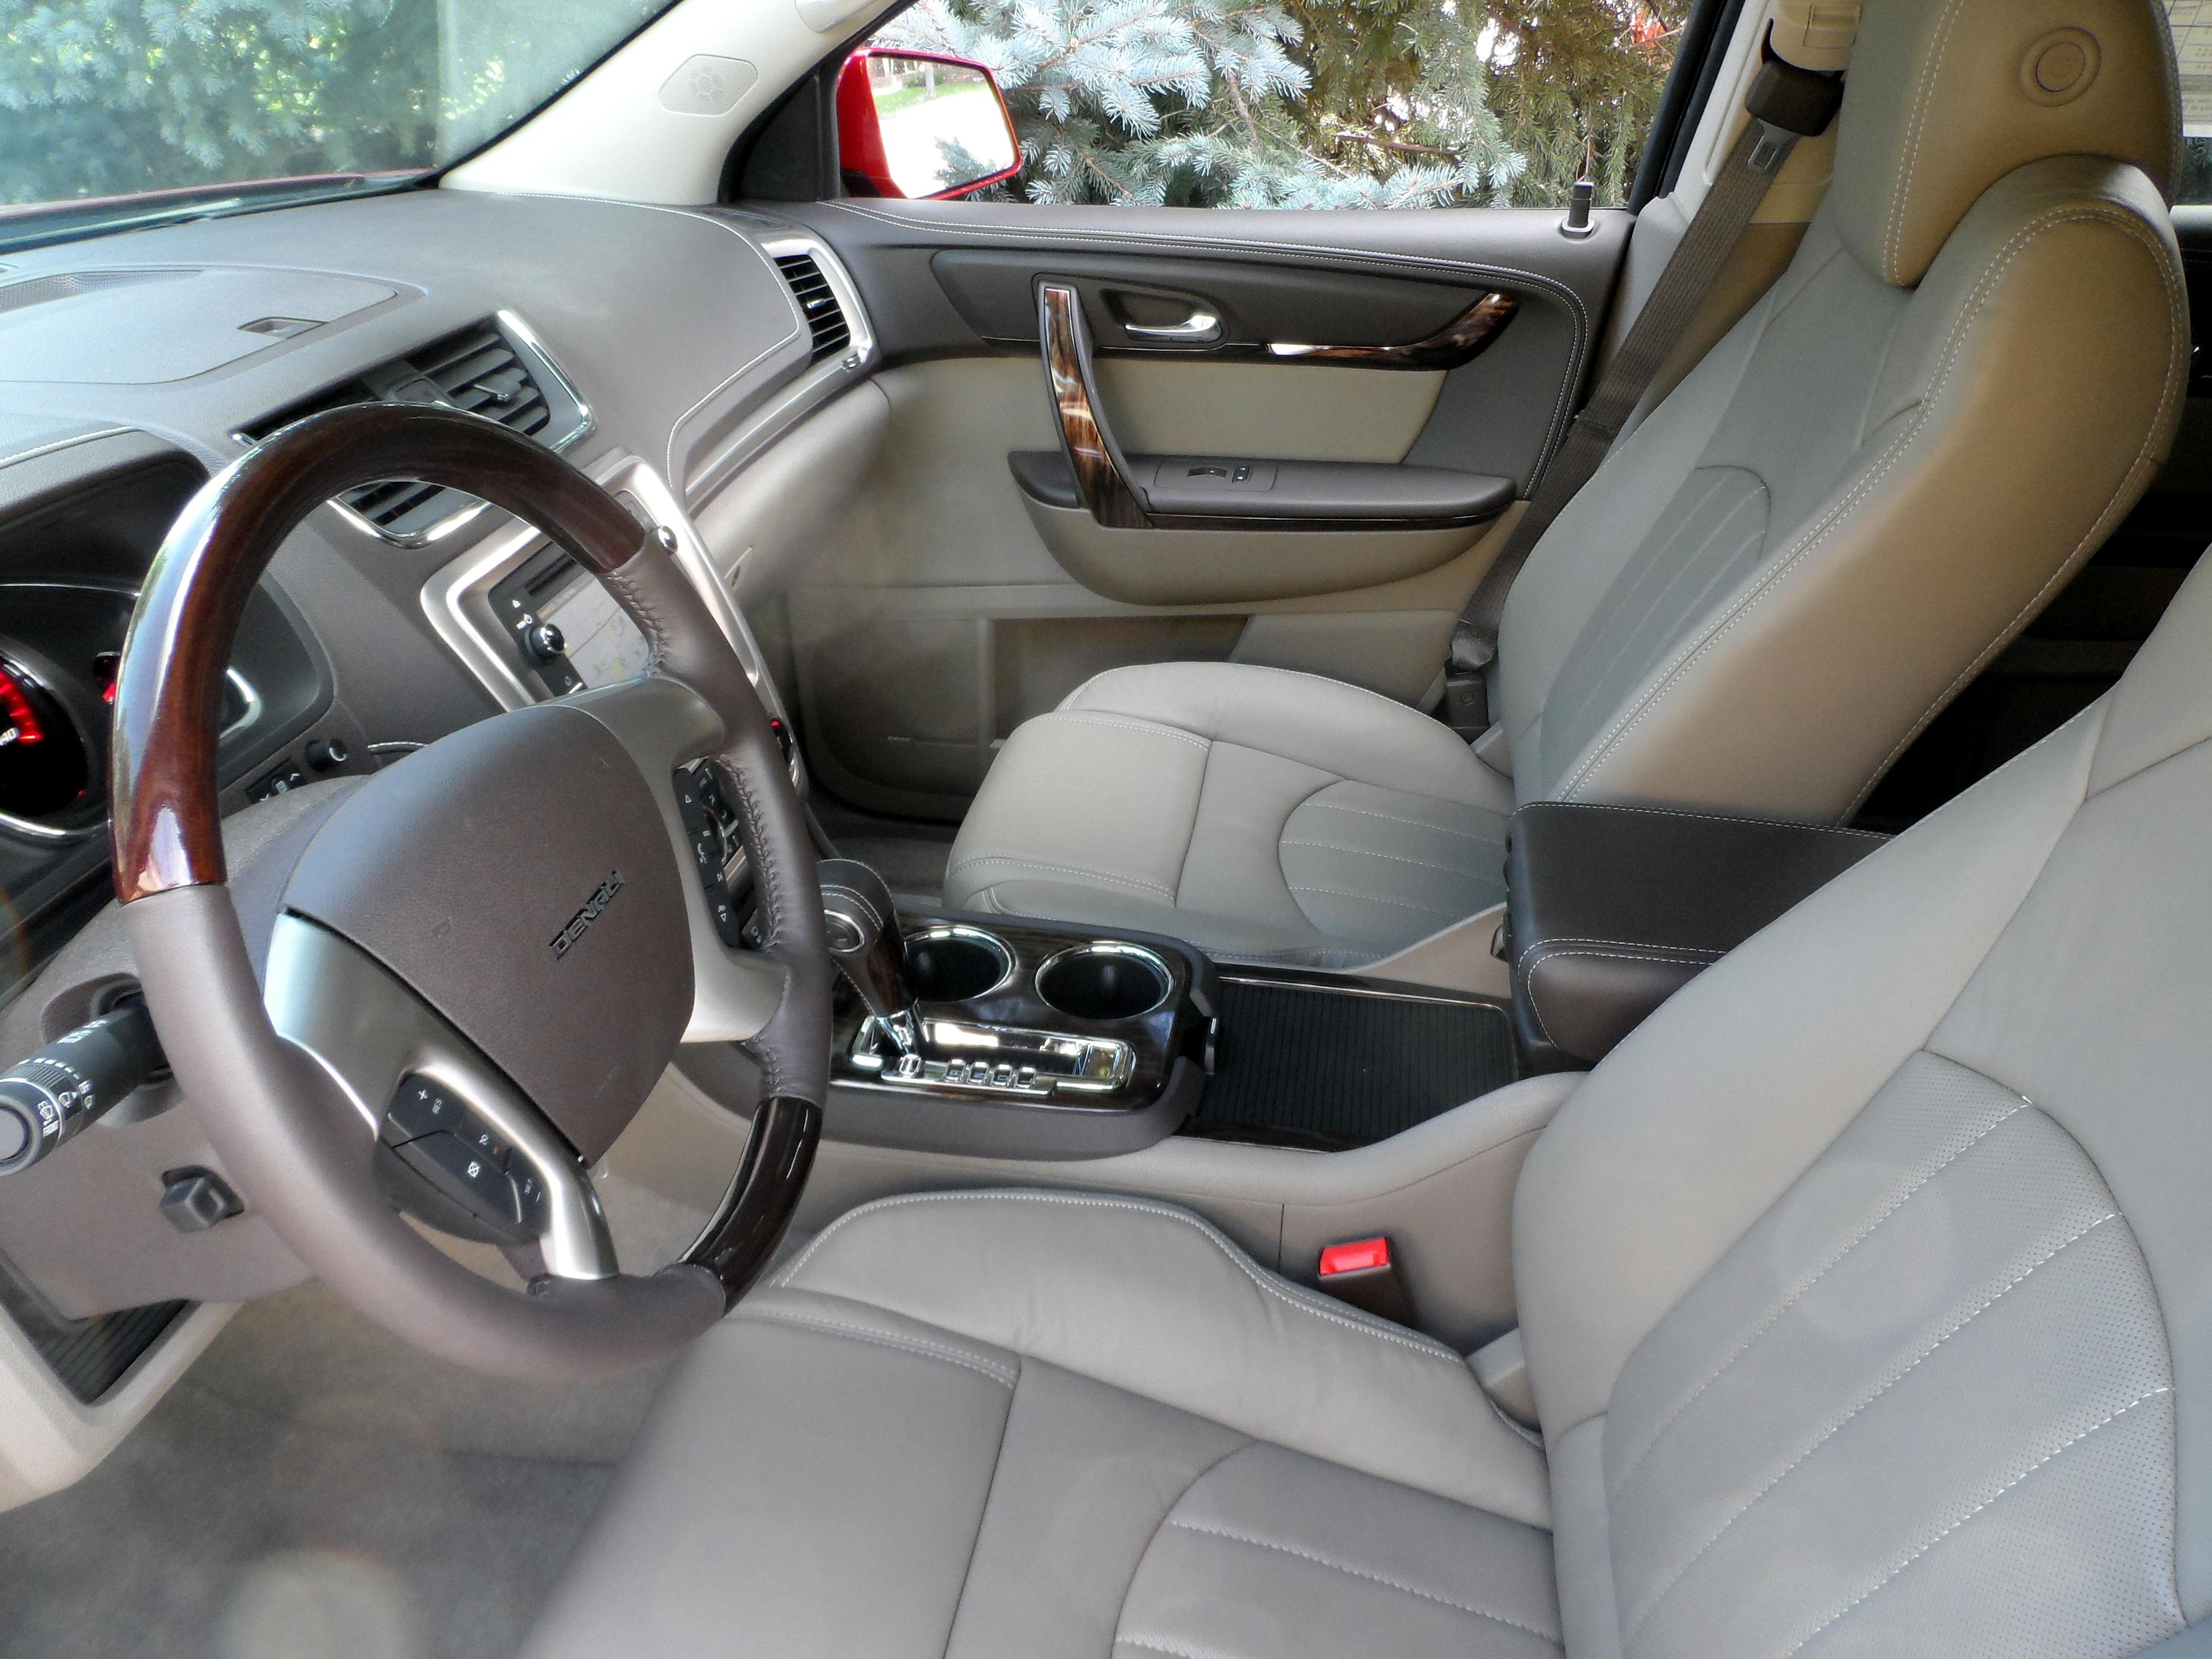 2014 GMC Acadia Denali AWD SUV – Stu's Reviews